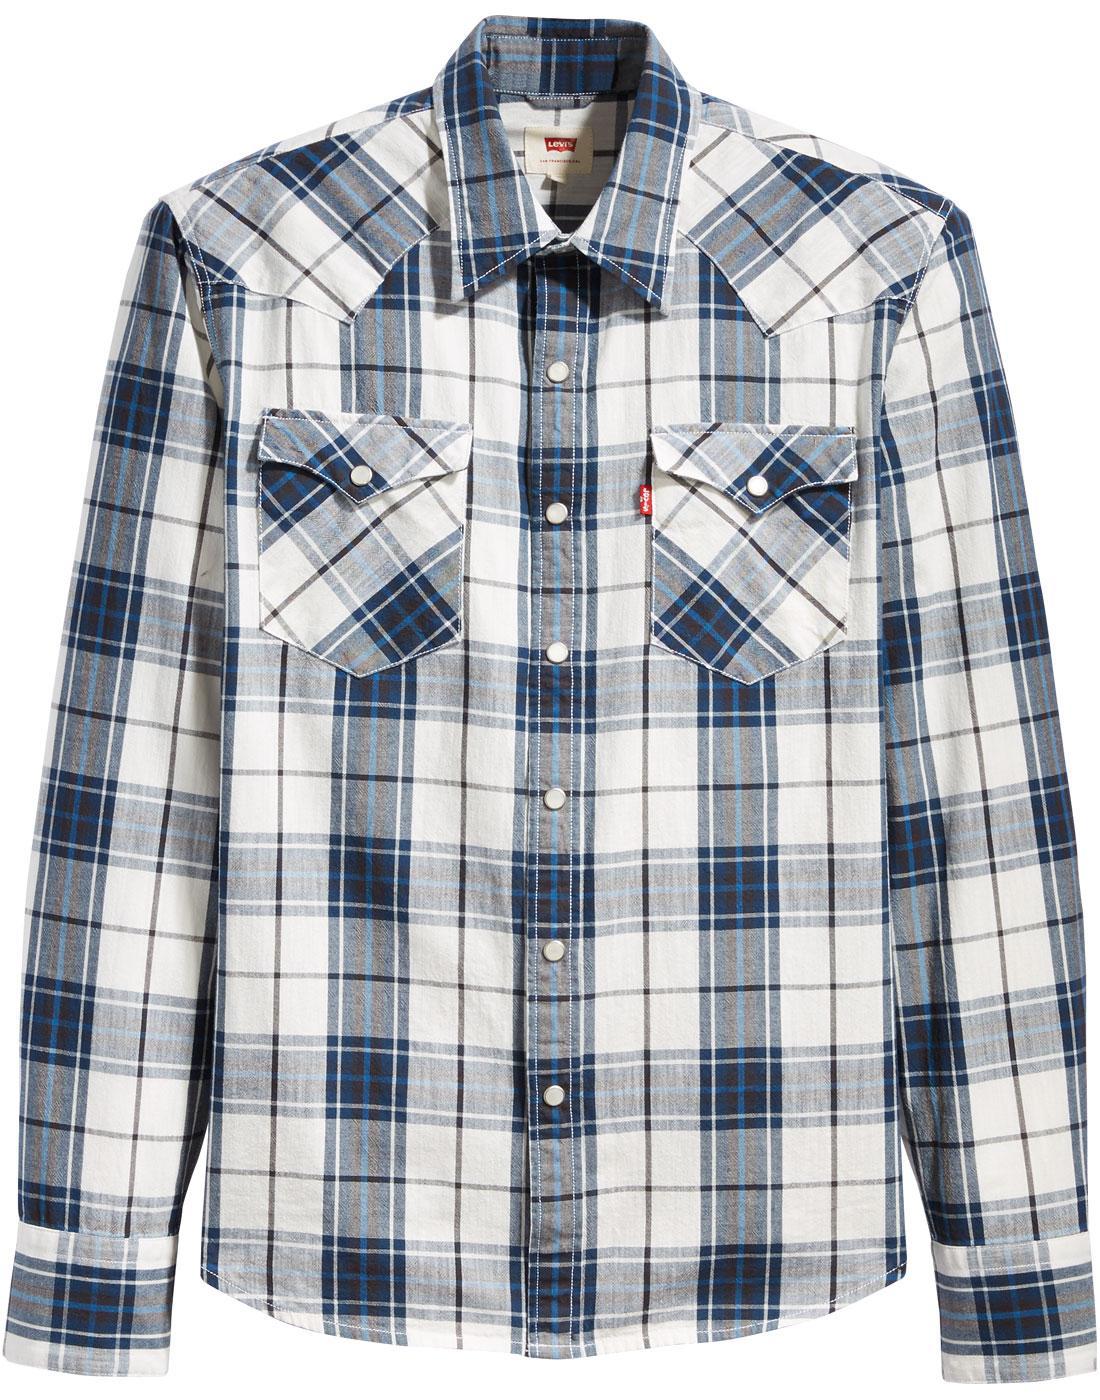 LEVI'S Barstow Retro 70s Check Western Shirt (WDB)